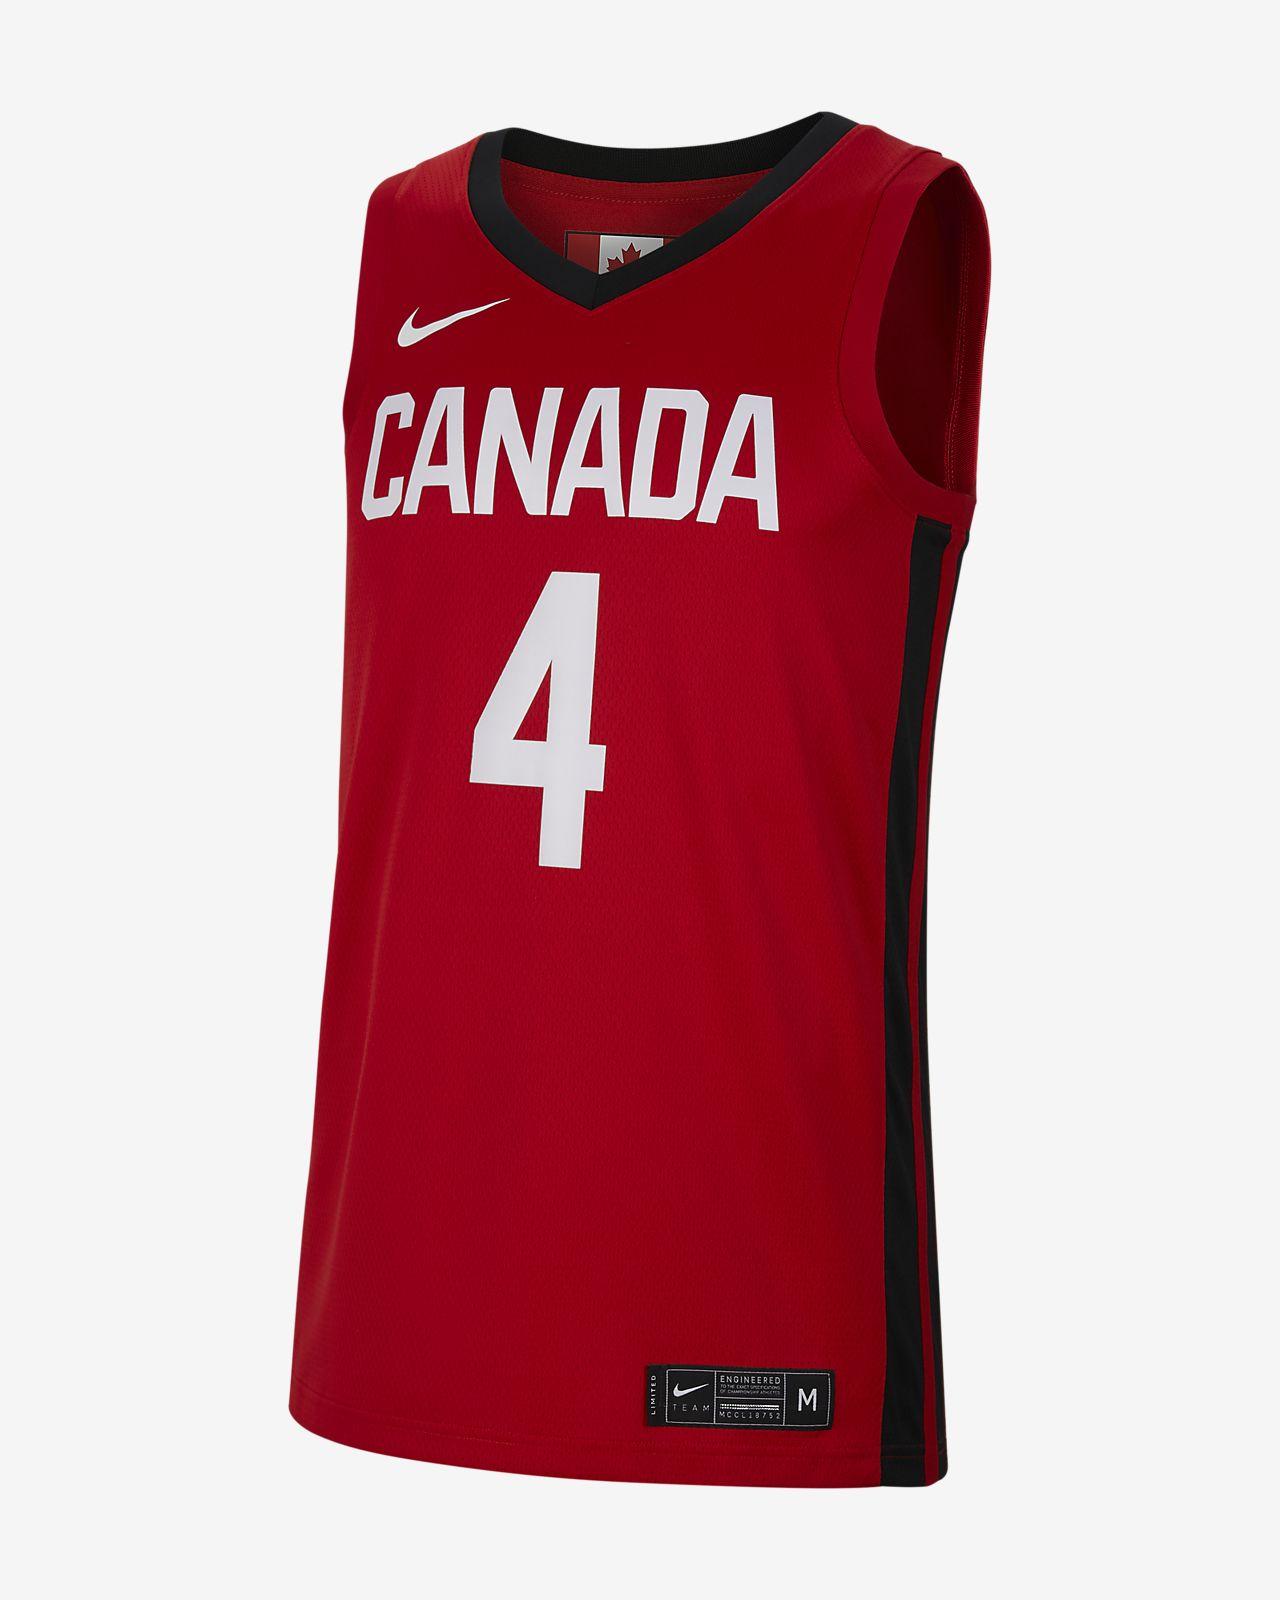 Camiseta de básquetbol para hombre Canada Nike (Road)